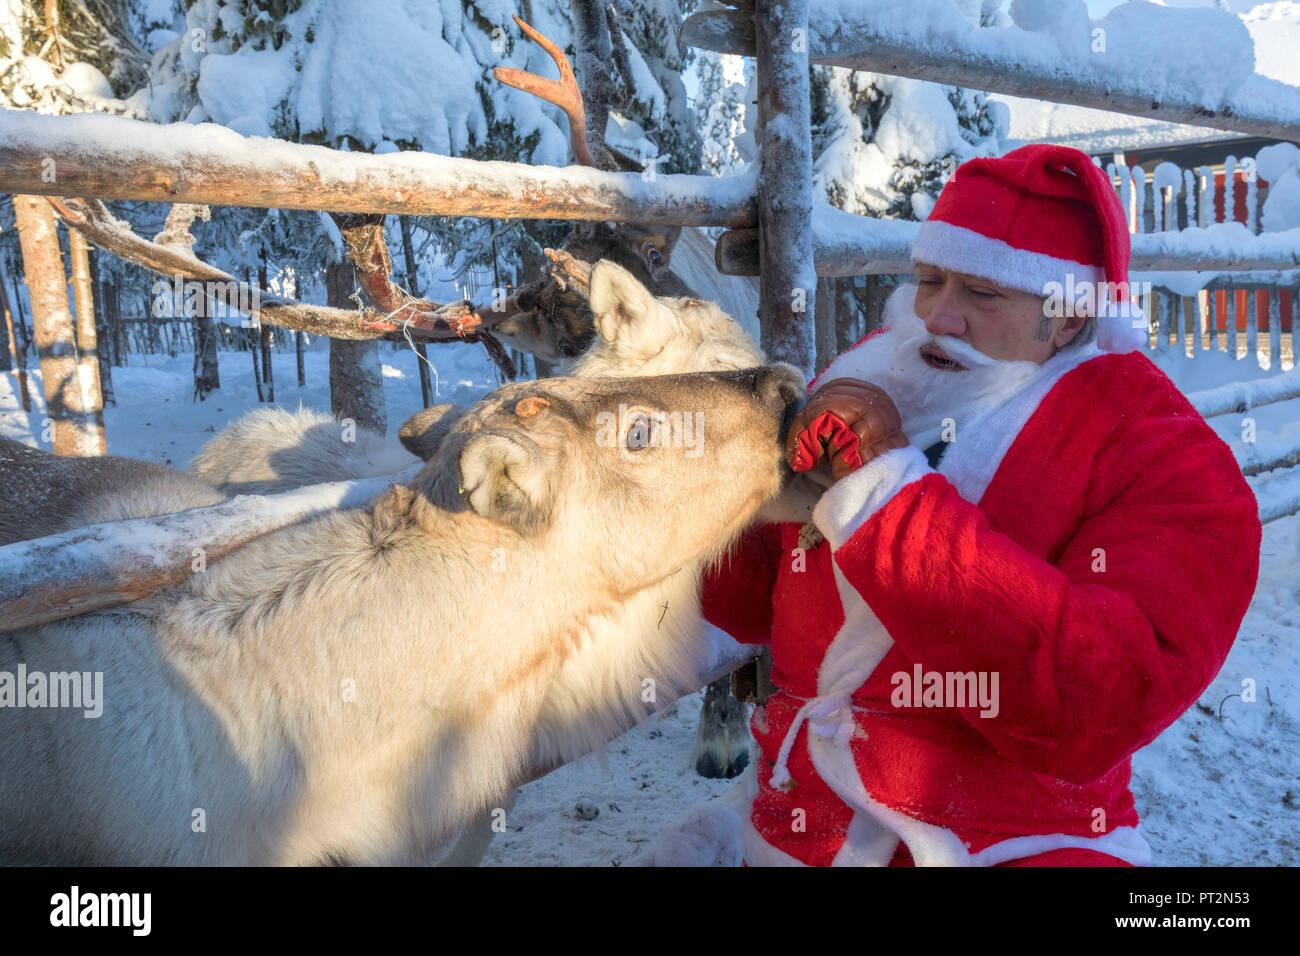 Santa Claus feeding reindeer, Ruka (Kuusamo), Northern Ostrobothnia region, Lapland, Finland - Stock Image